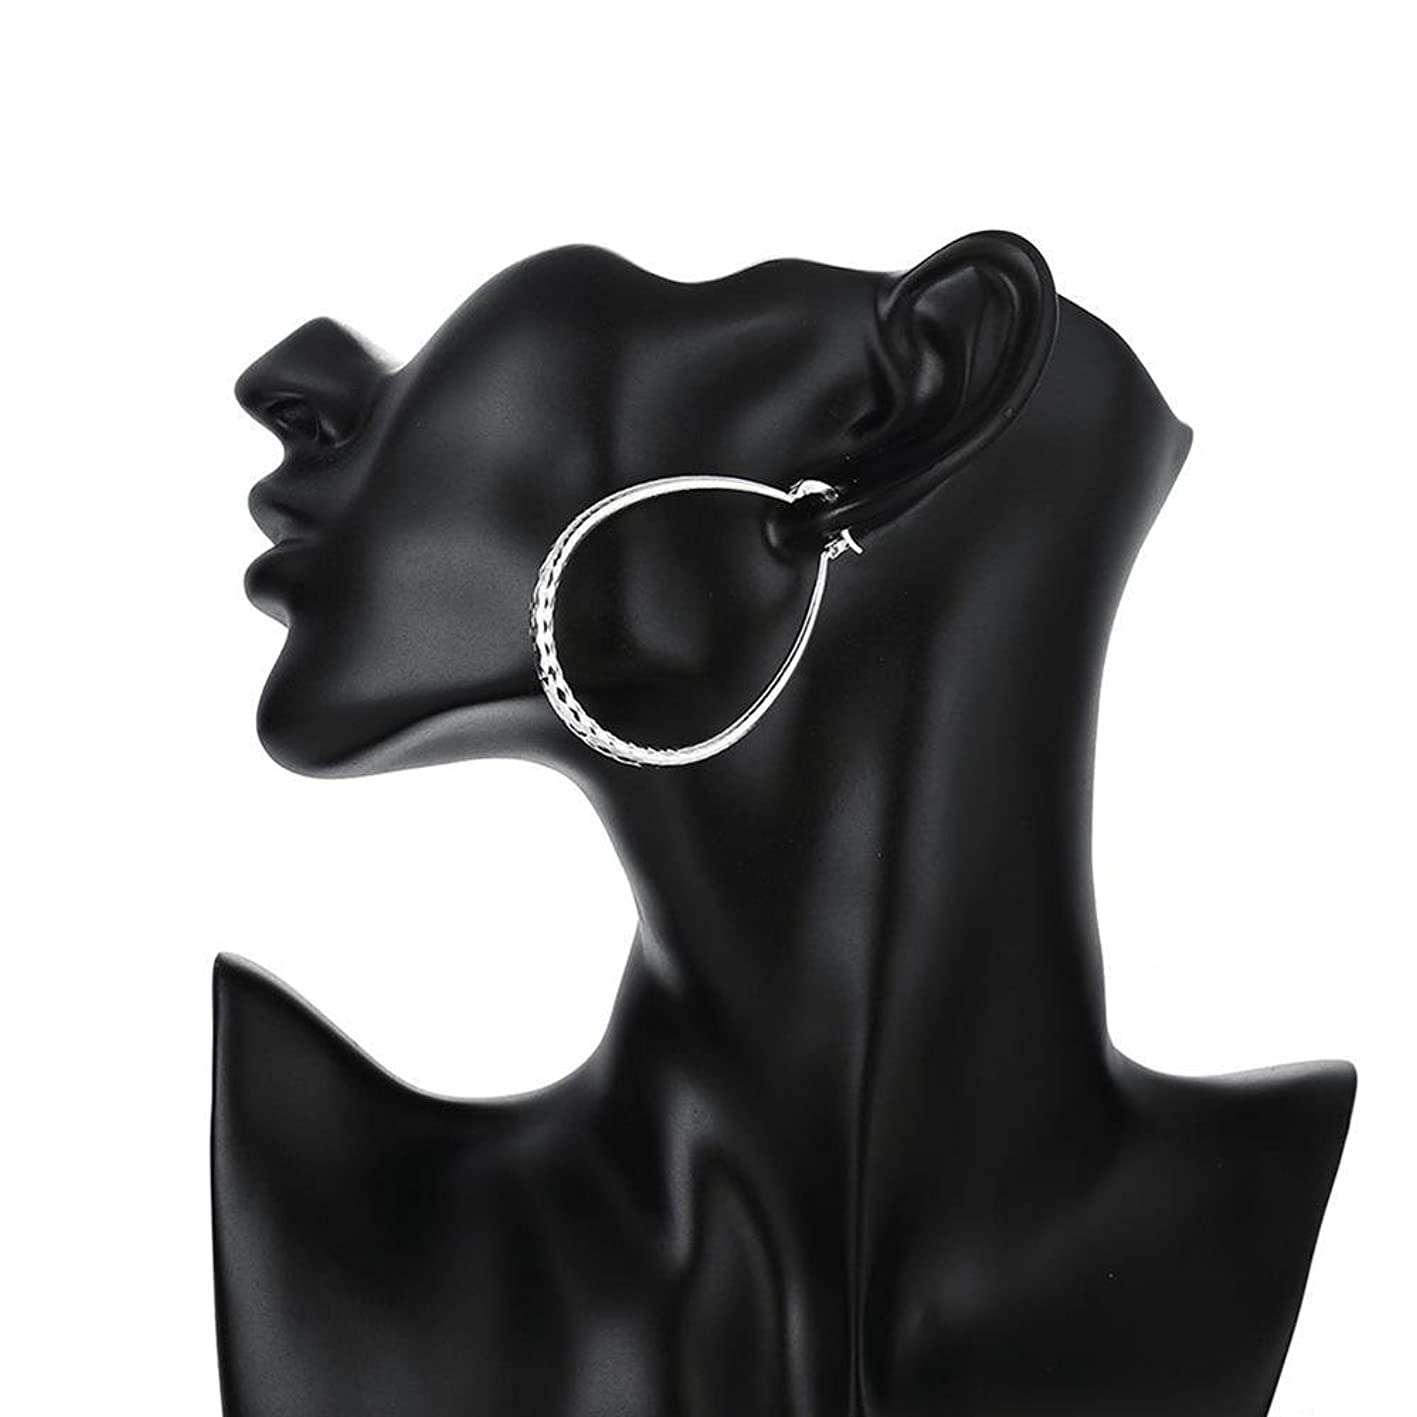 NAOMI 925 Sterling Silver Textured Ear Studs Large Round Hoop Earrings bryynvqfuwv889